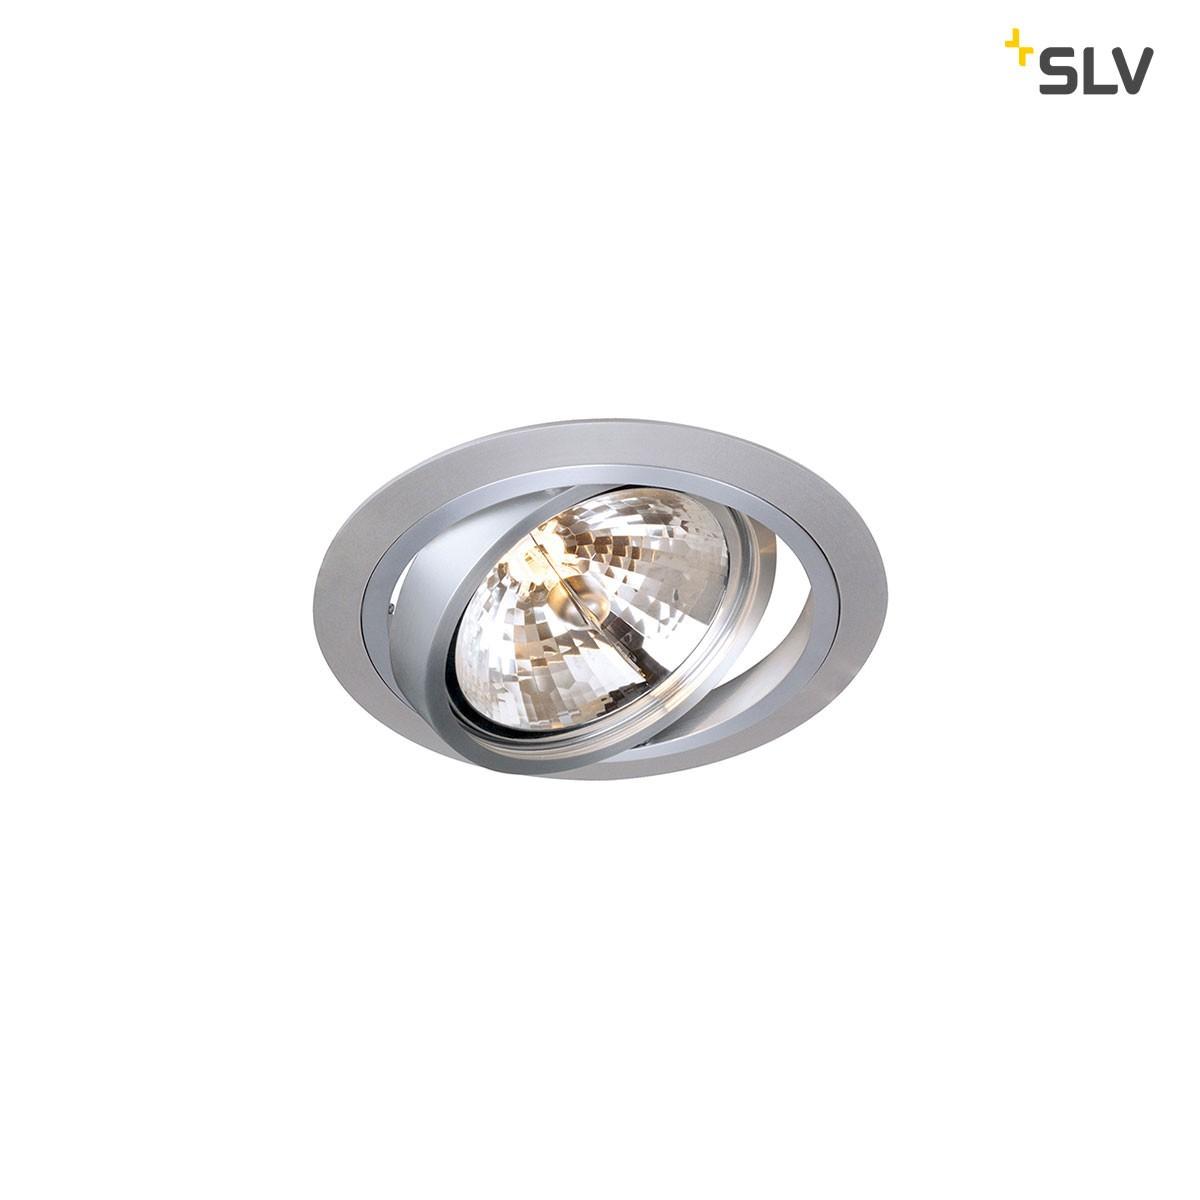 SLV New Tria Einbaustrahler, rund, G53, Aluminium gebürstet